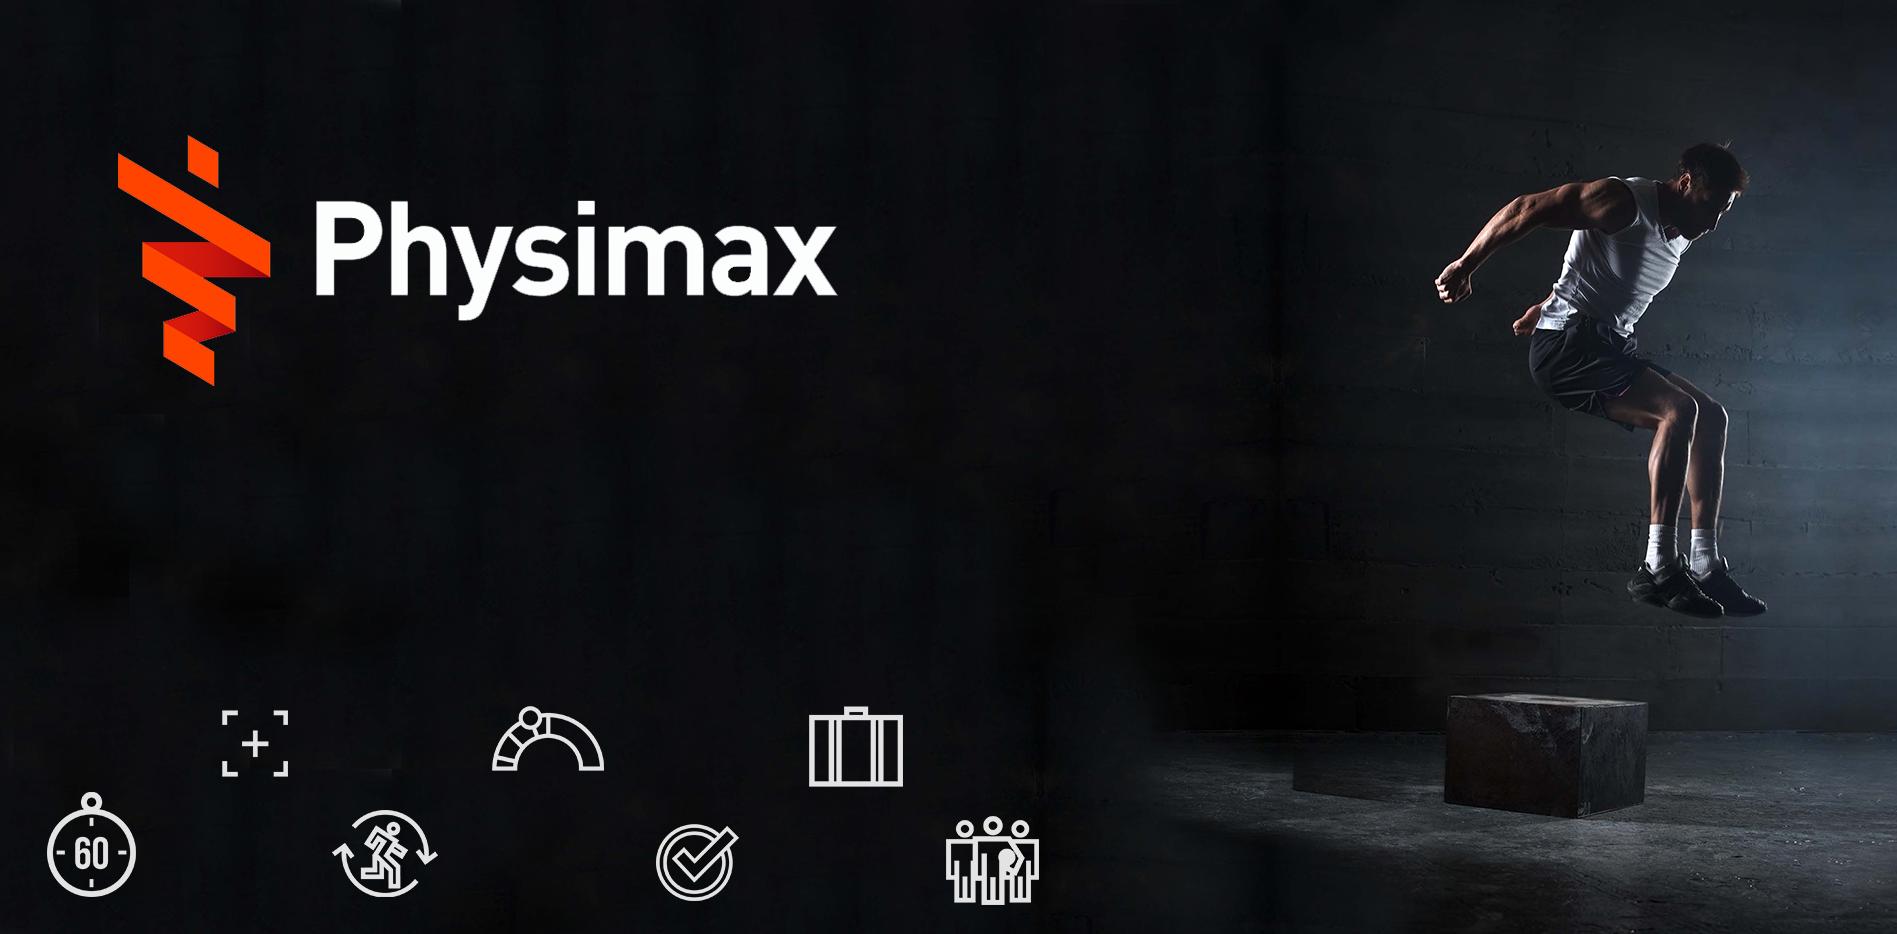 Physimax